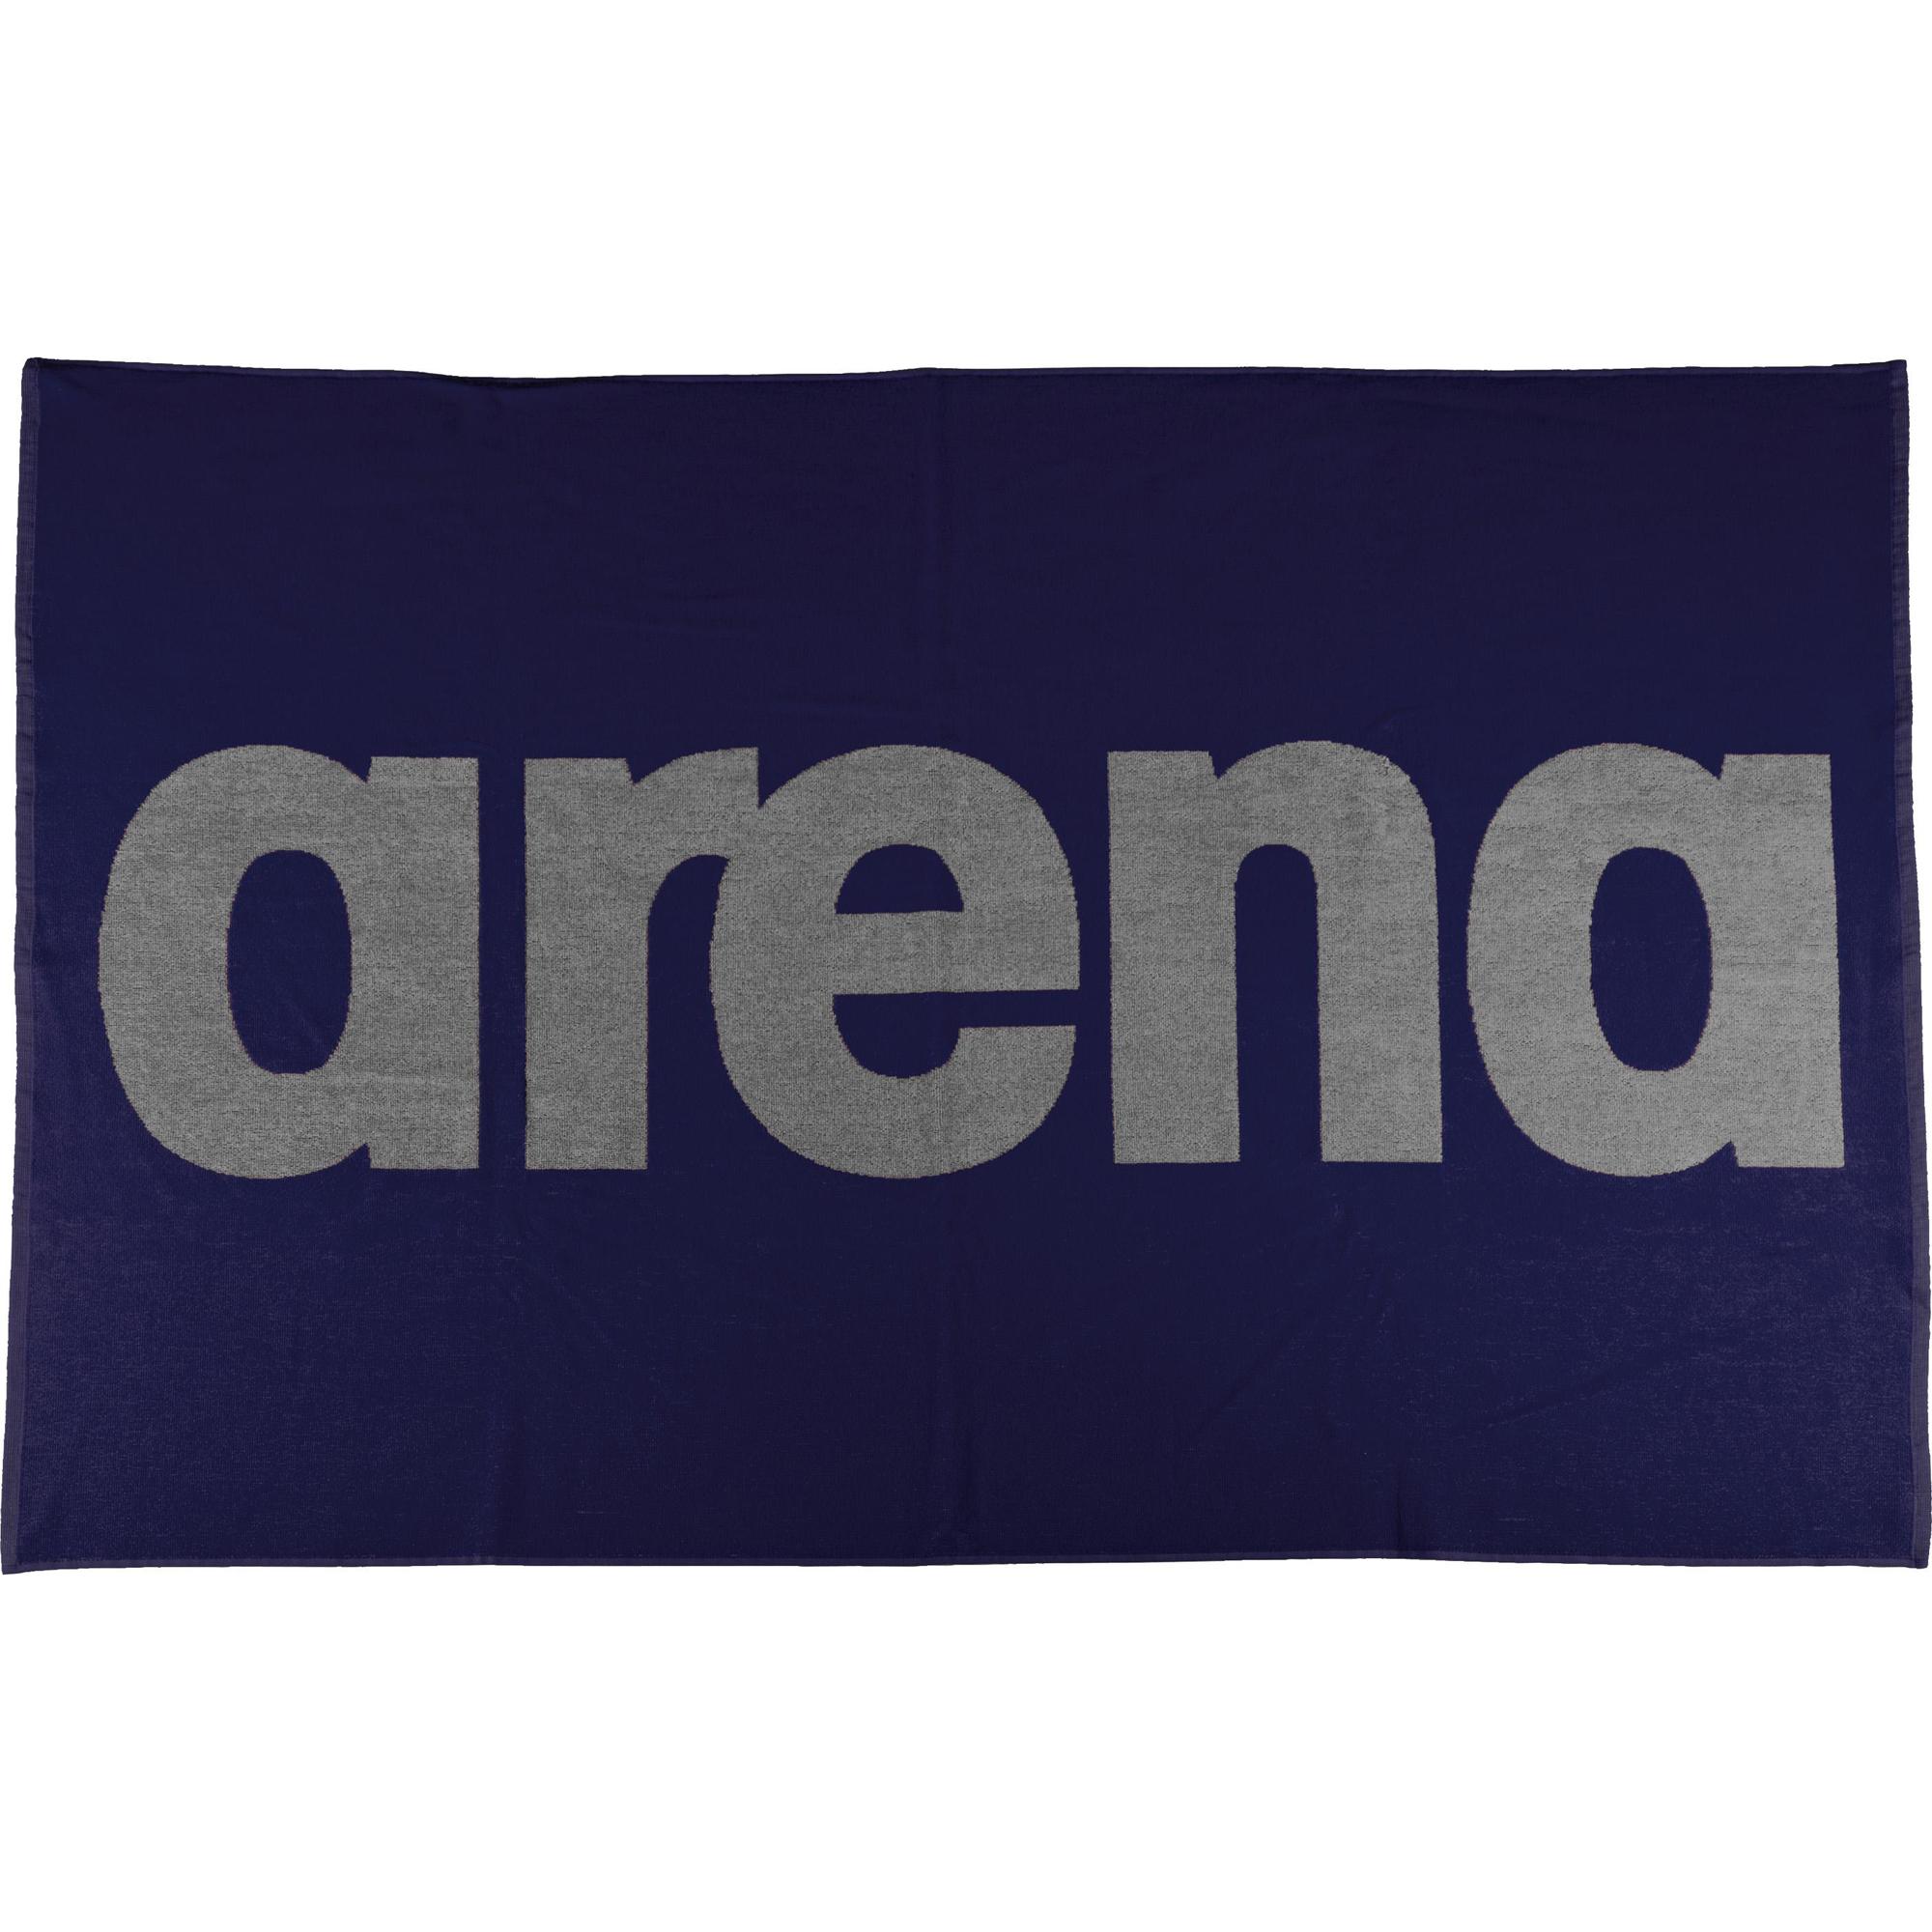 Arena Handtuch groß Handy 2A490-75